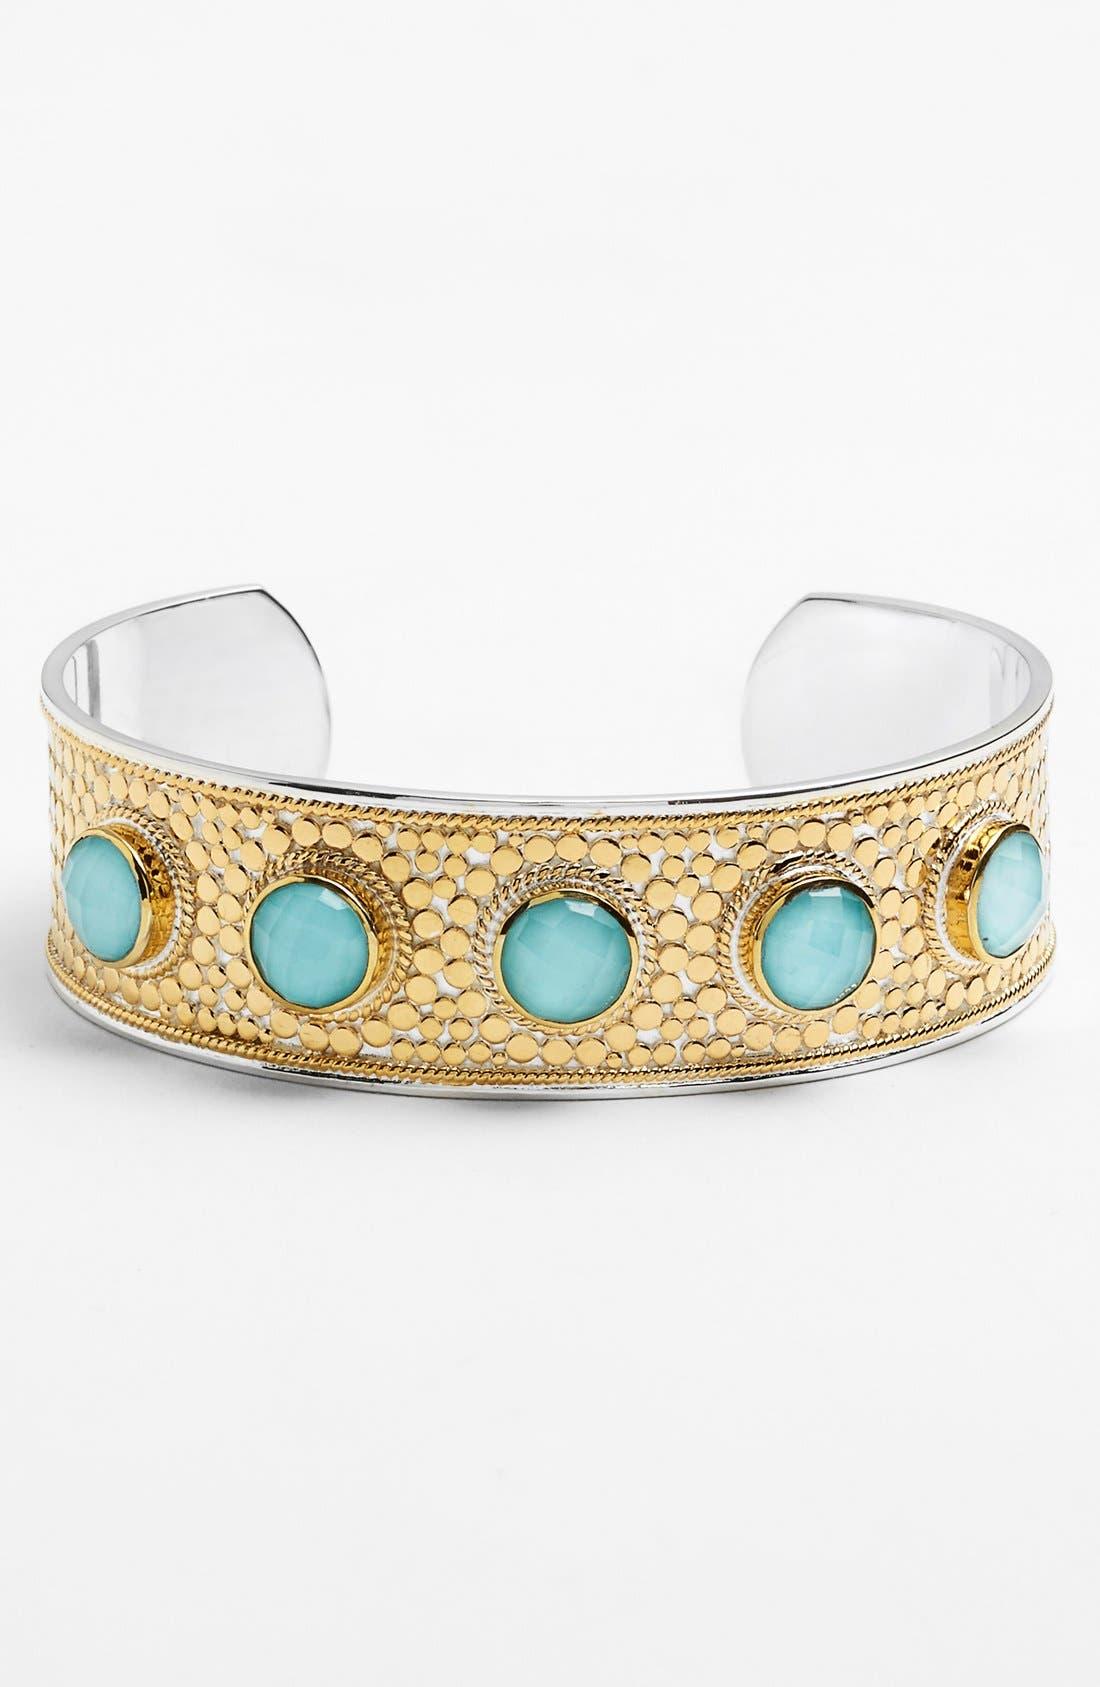 Main Image - Anna Beck 'Gili' Turquoise Stone Cuff